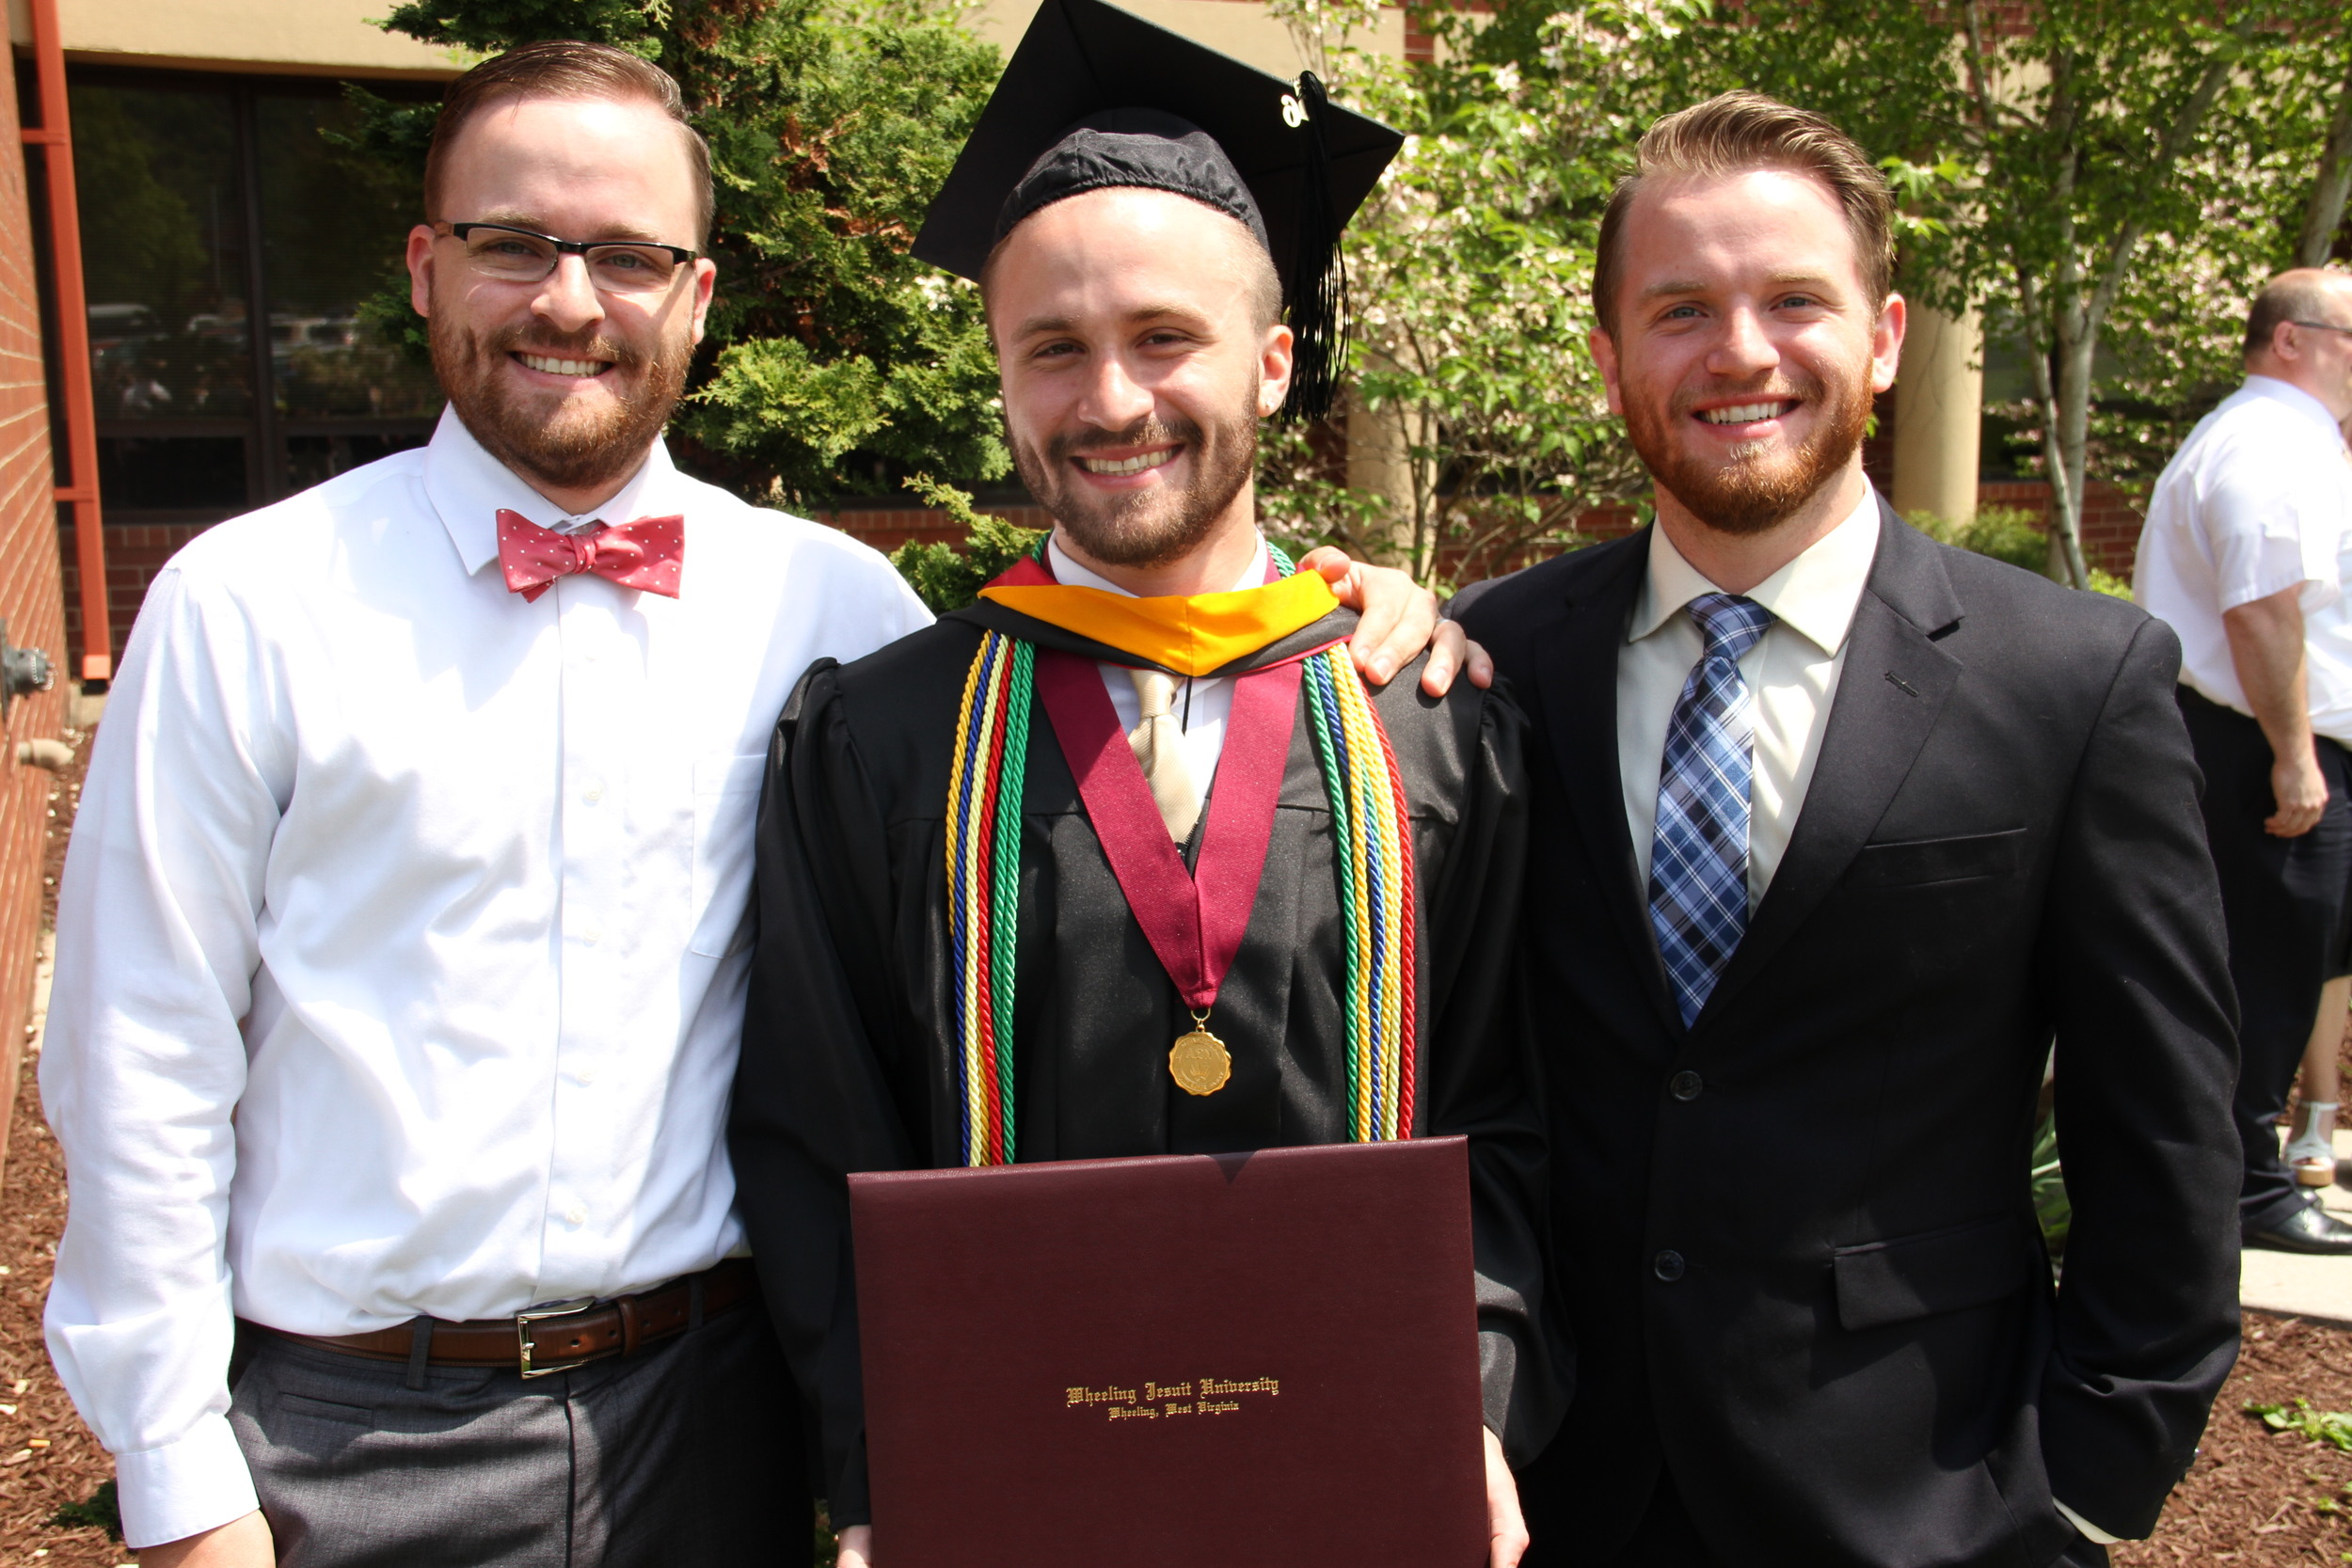 Wheeling Jesuit University Graduates Joe Probert '11, Stephen Probert '16 and Michael Probert '14 (Photo by Wheeling Jesuit University)